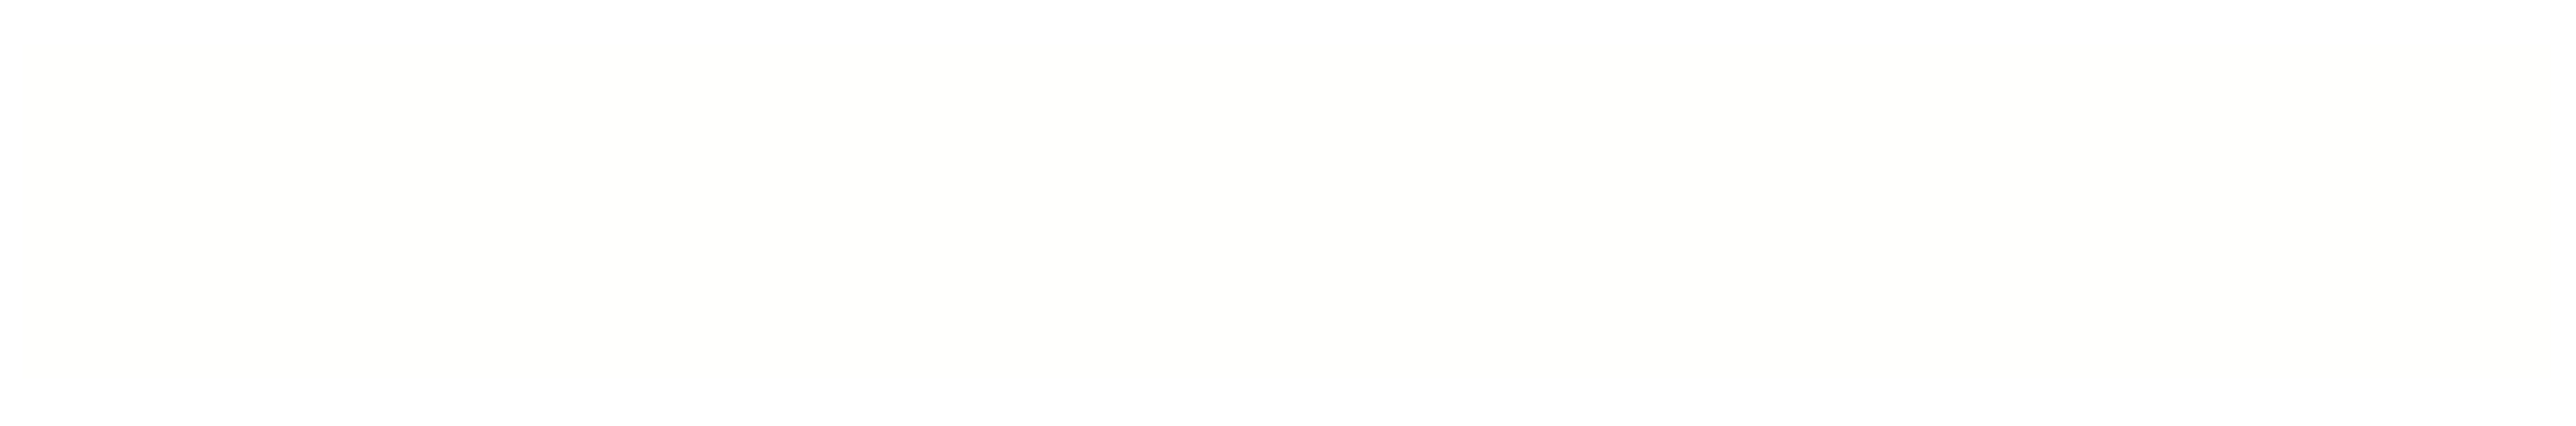 M&A Worldwide